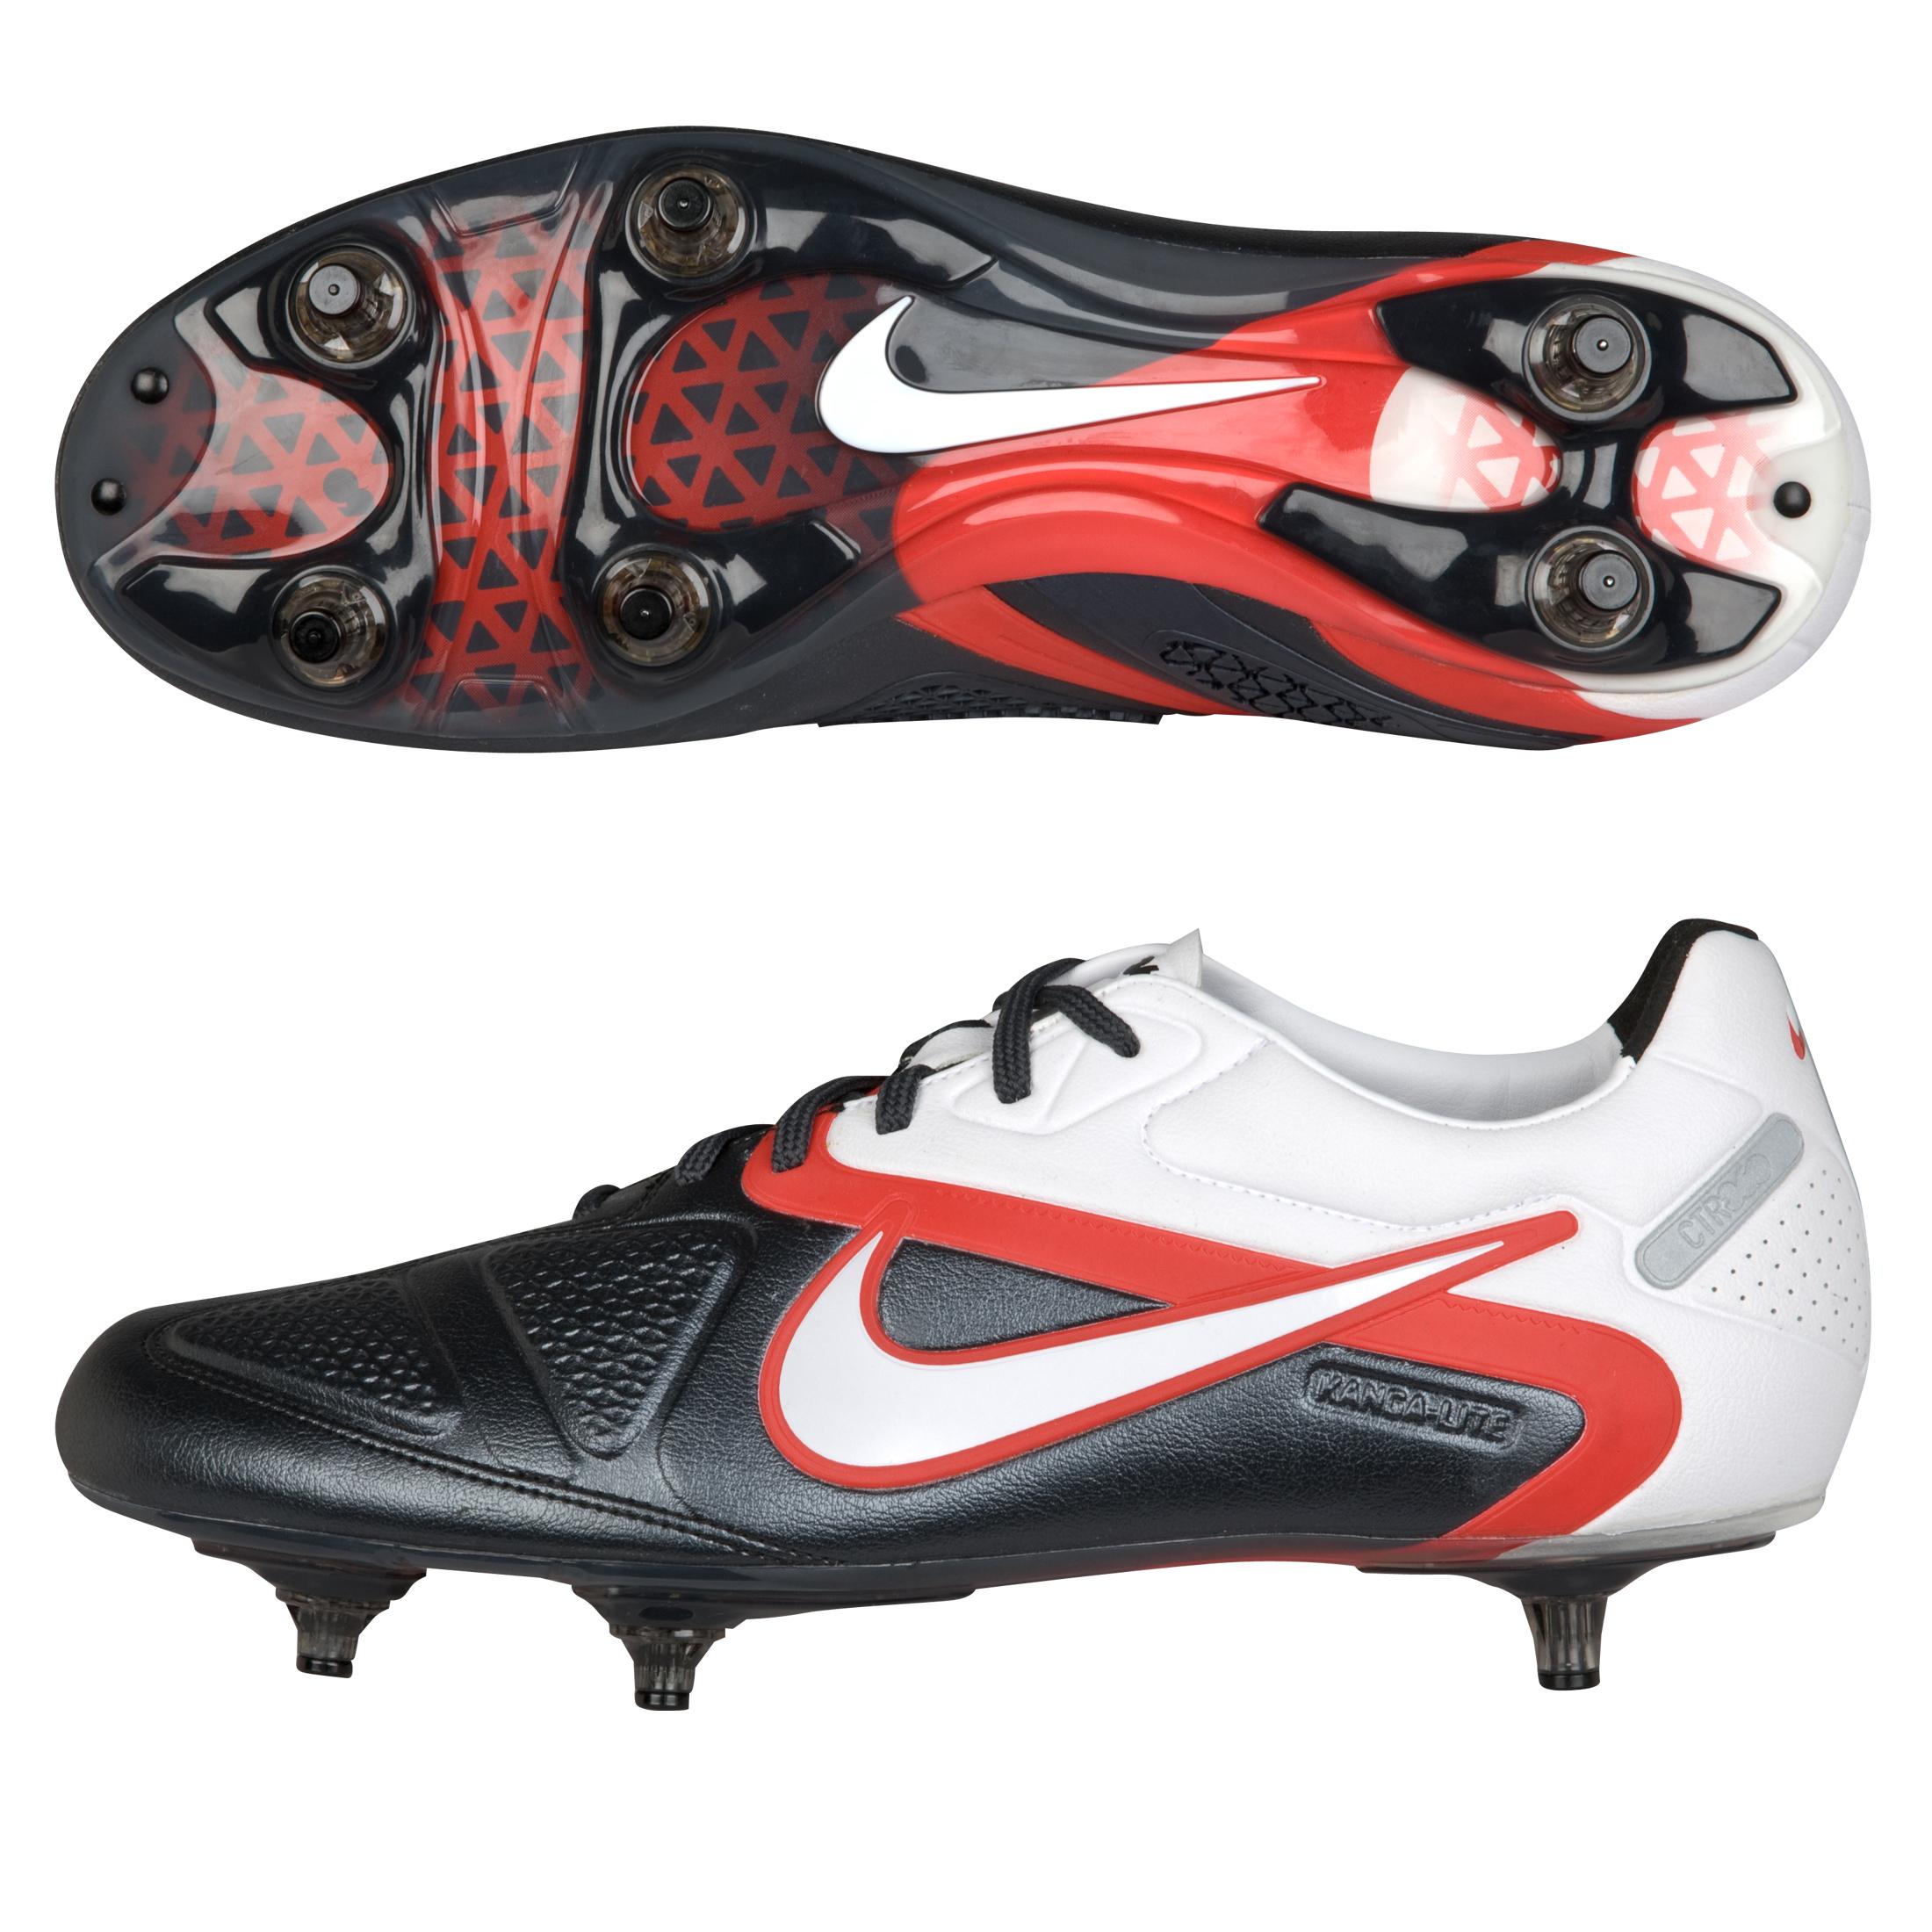 Nike CTR360 Maestri II Soft Ground Black/White/Challenge Red